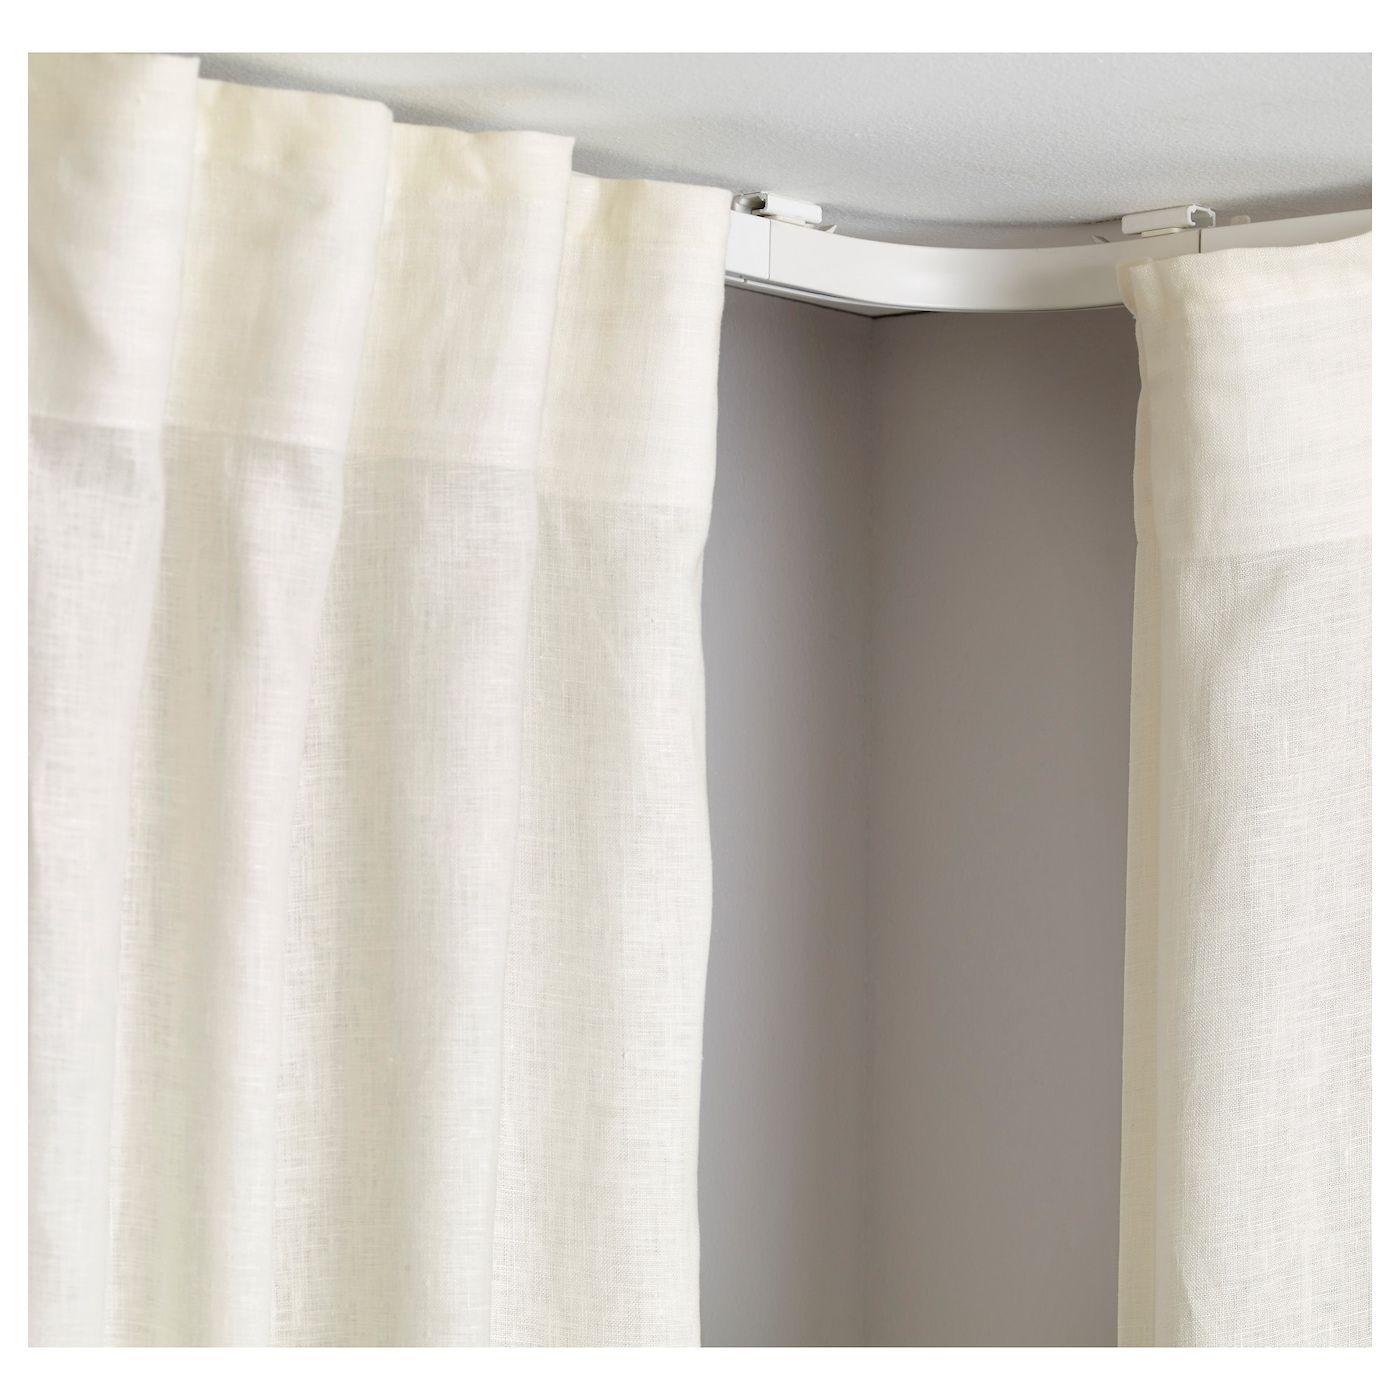 Vidga Corner Solution White Ikea Curtains Corner Curtain Rod Shower Curtain Rods